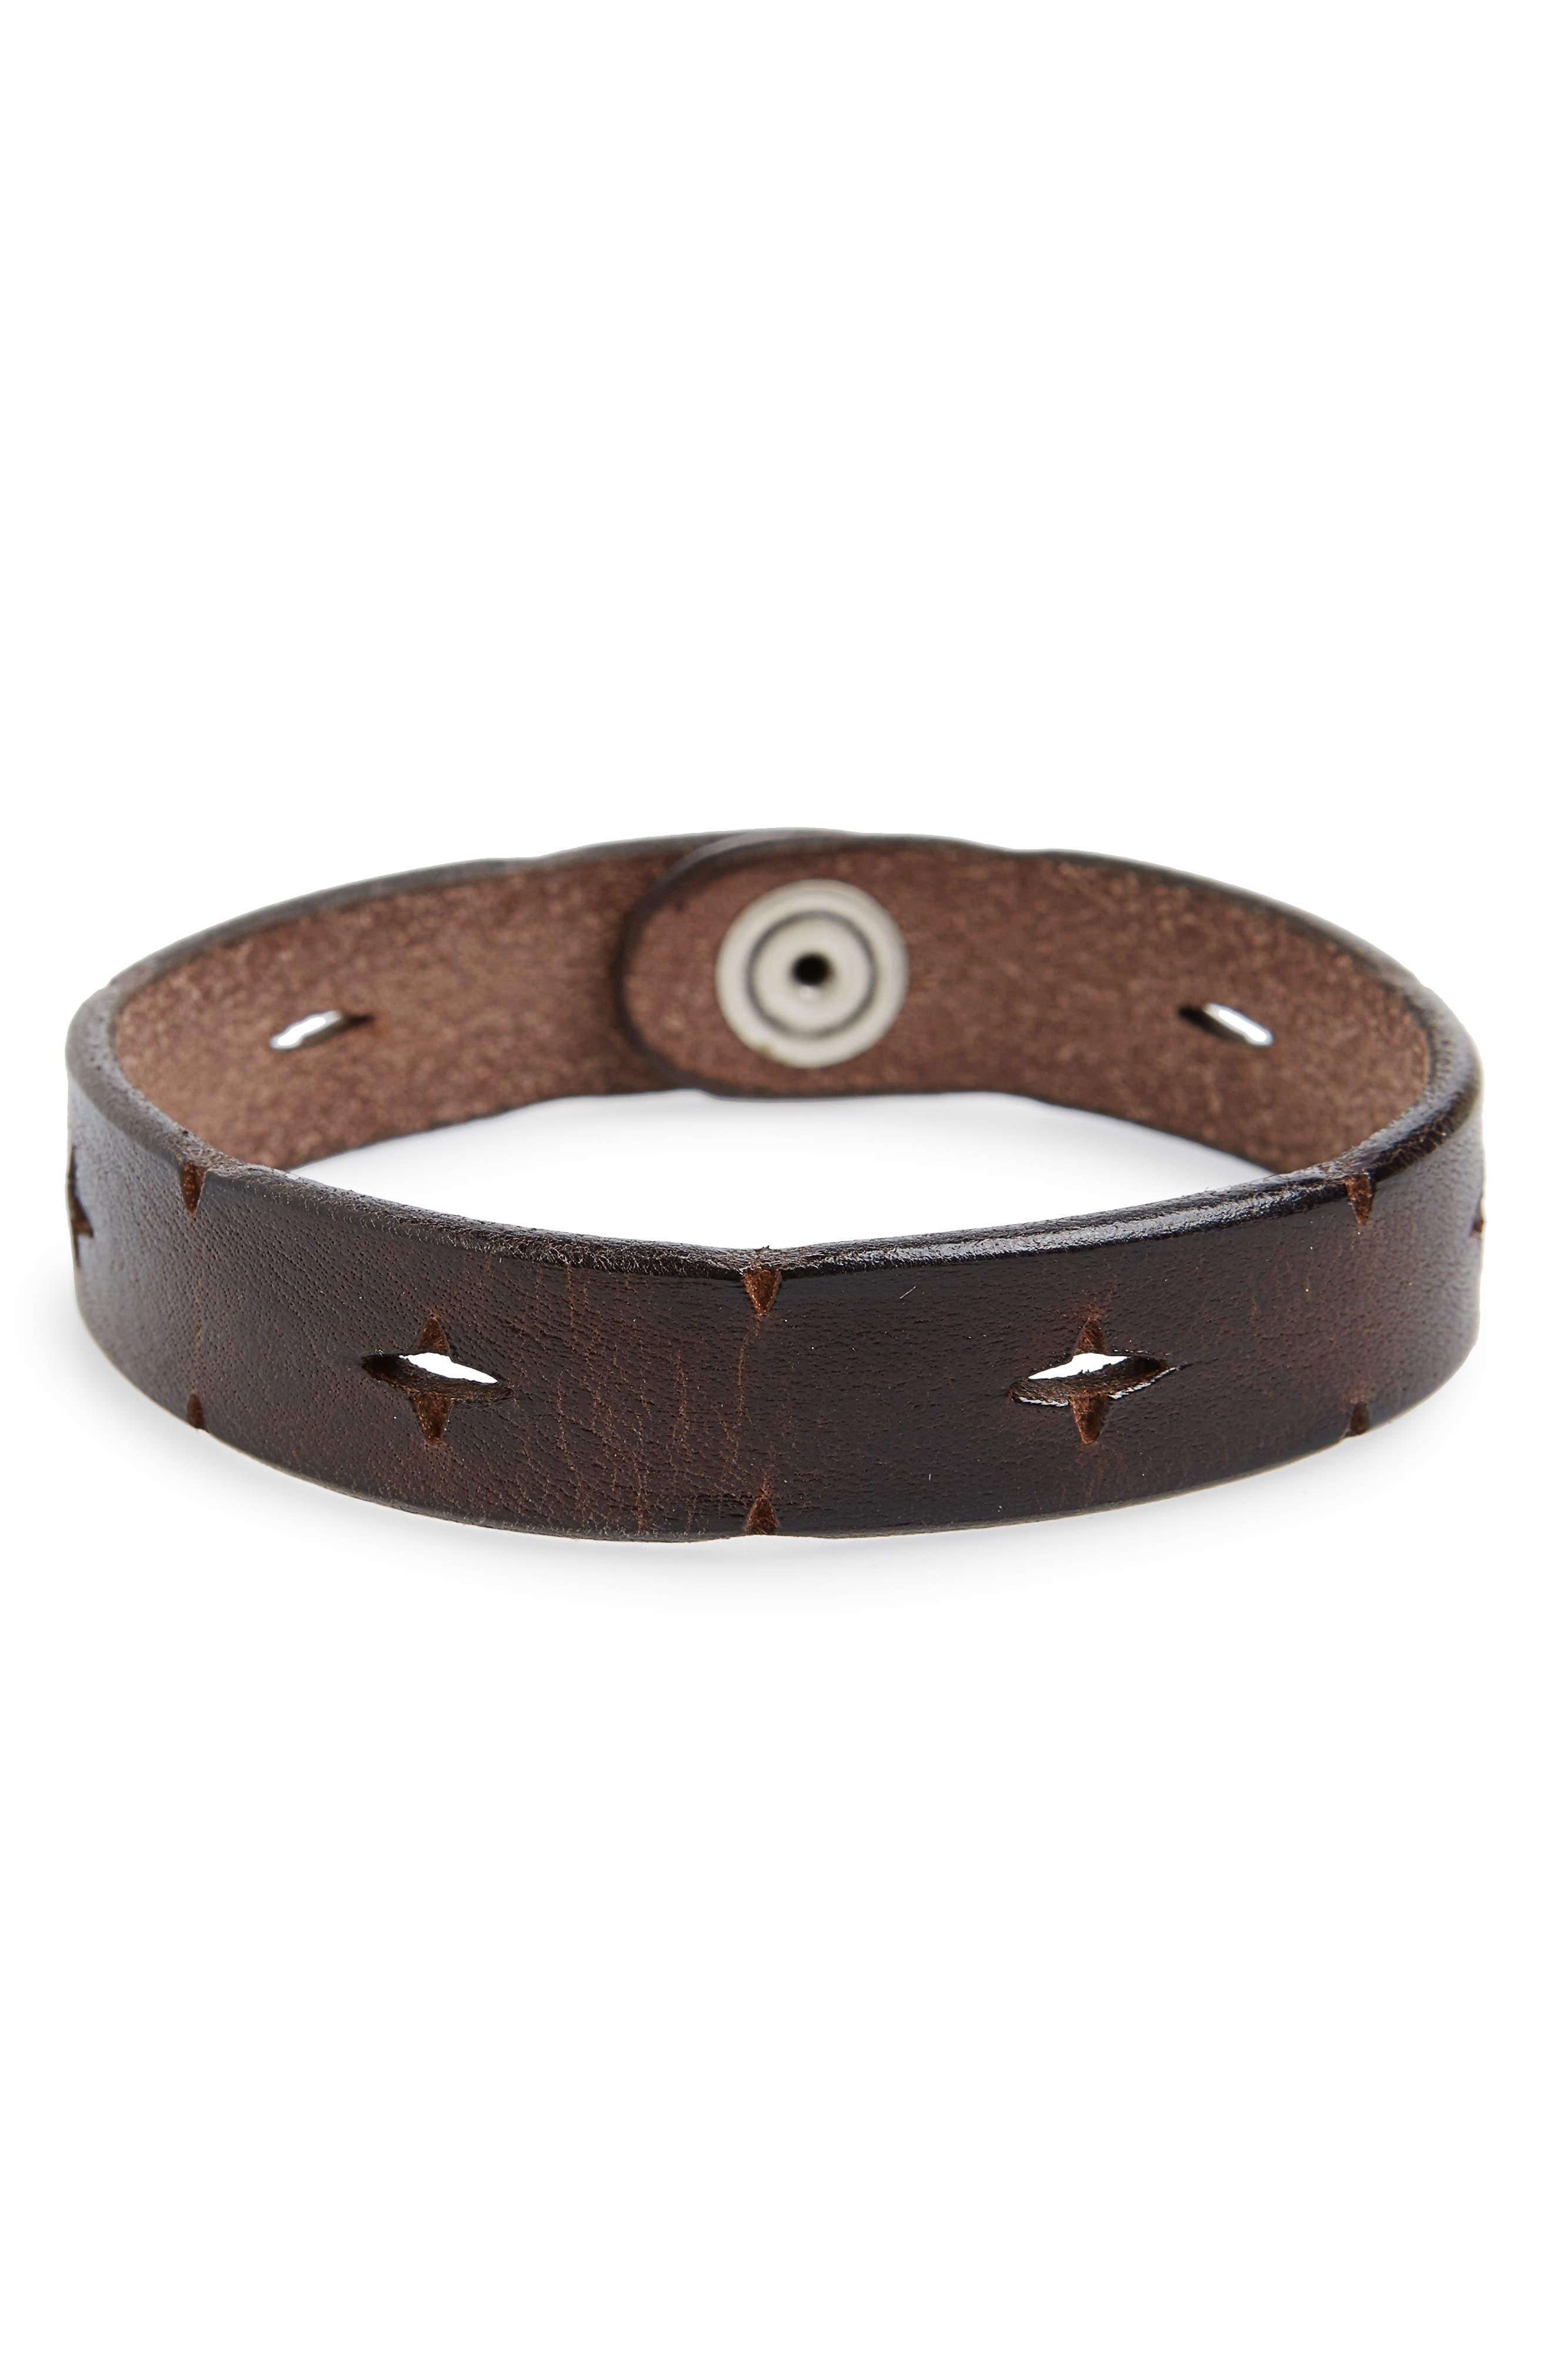 Wax Leather Bracelet,                         Main,                         color, T. Moro